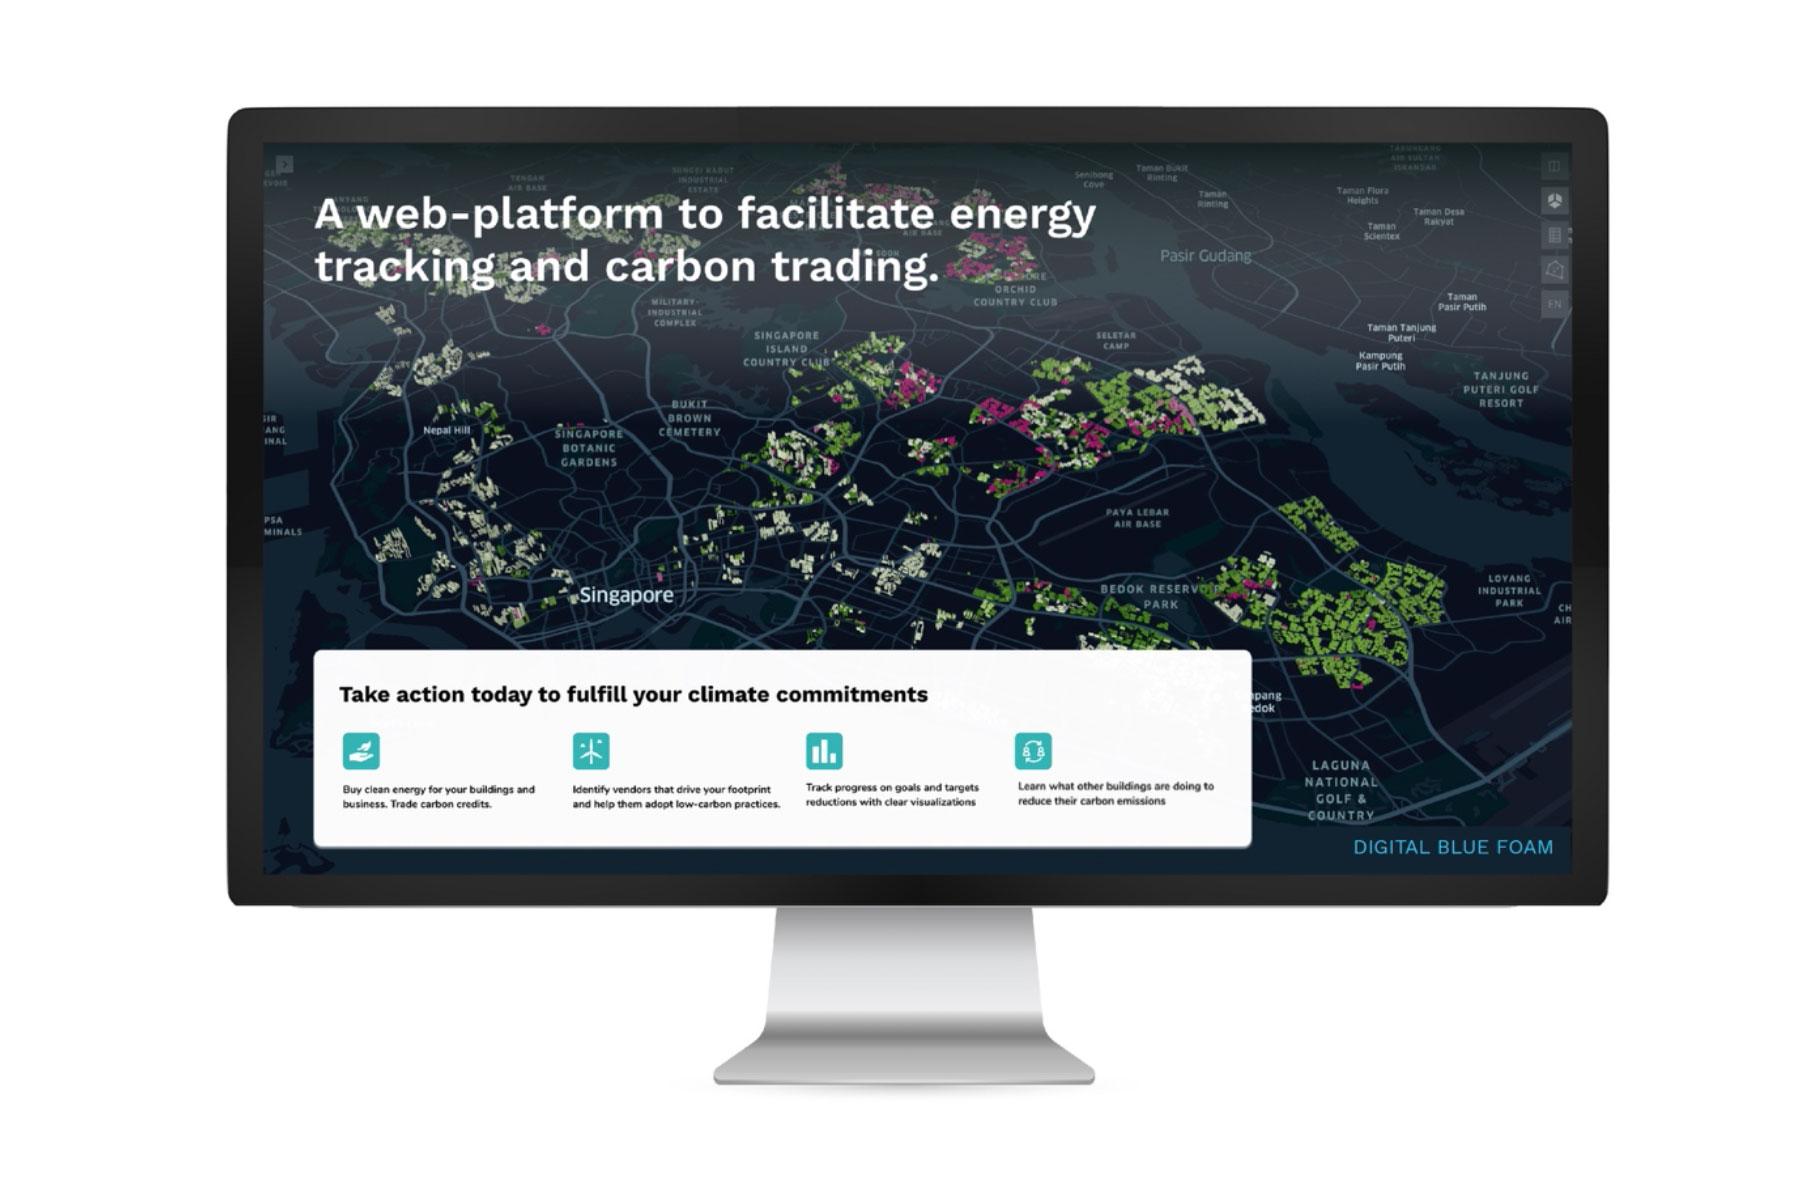 Digital Blue Foam Carbon Trading Platform